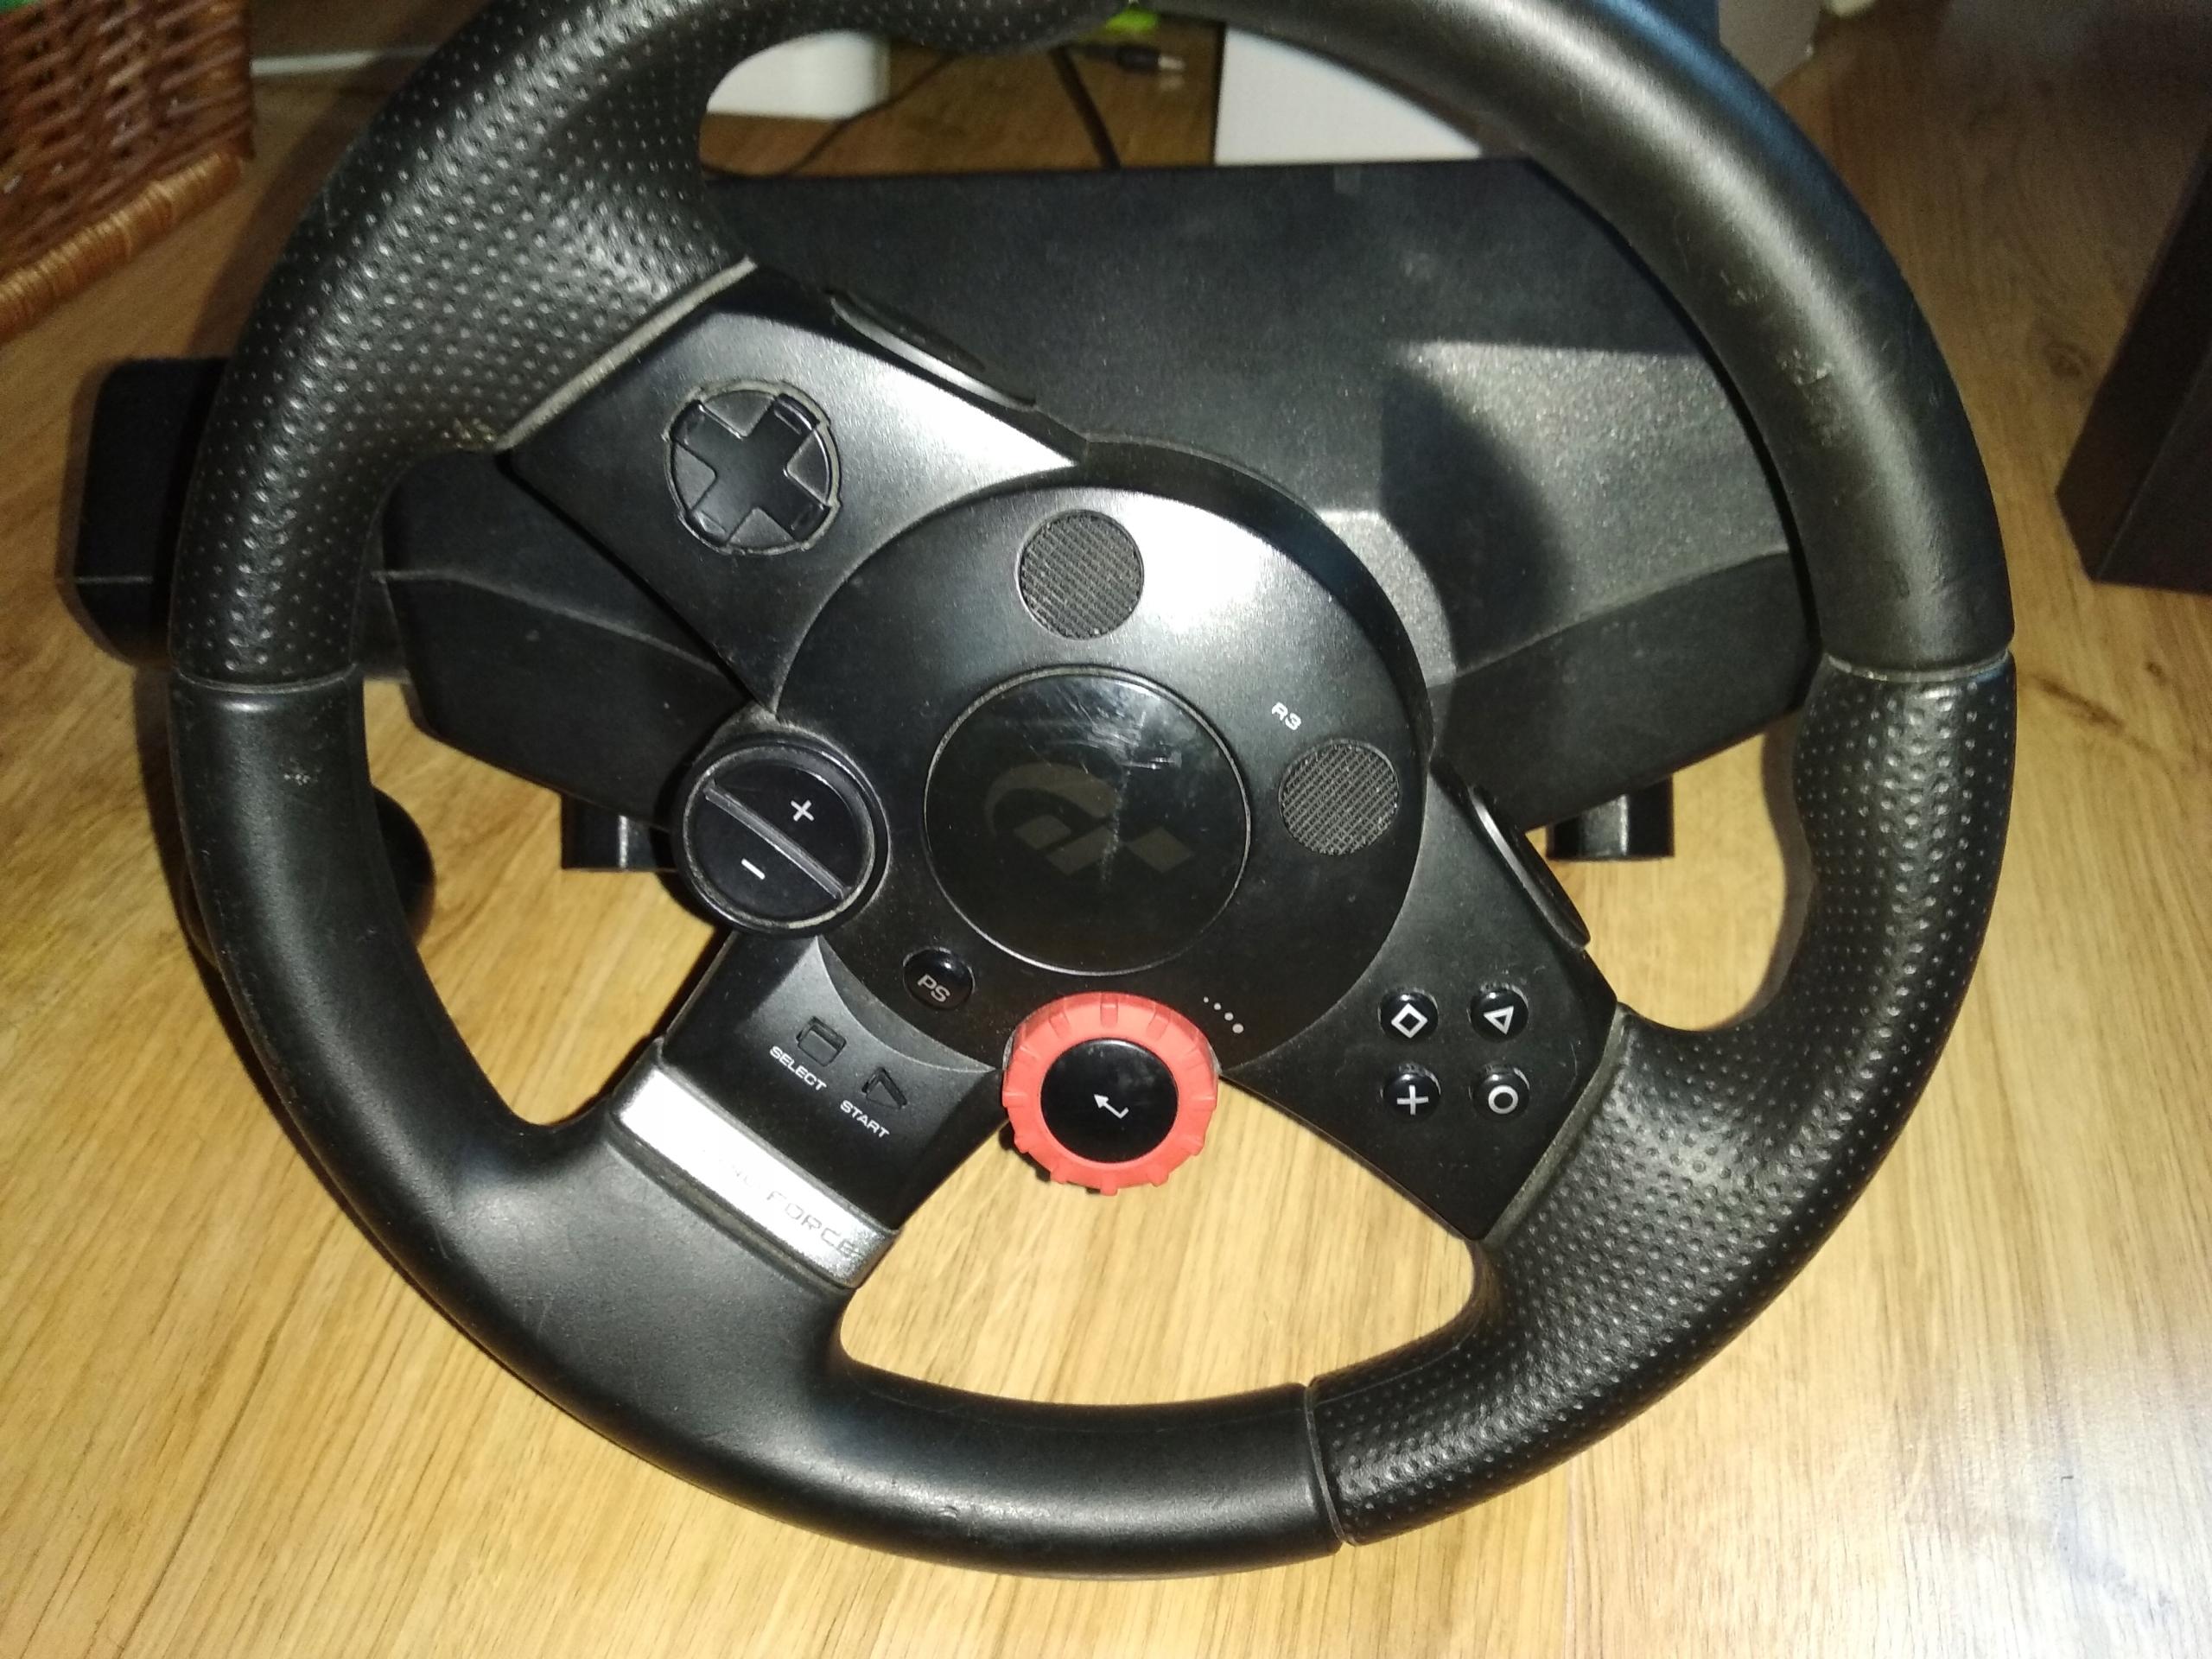 KIEROWNICA LOGITECH DRIVING FORCE GT PC / PS3